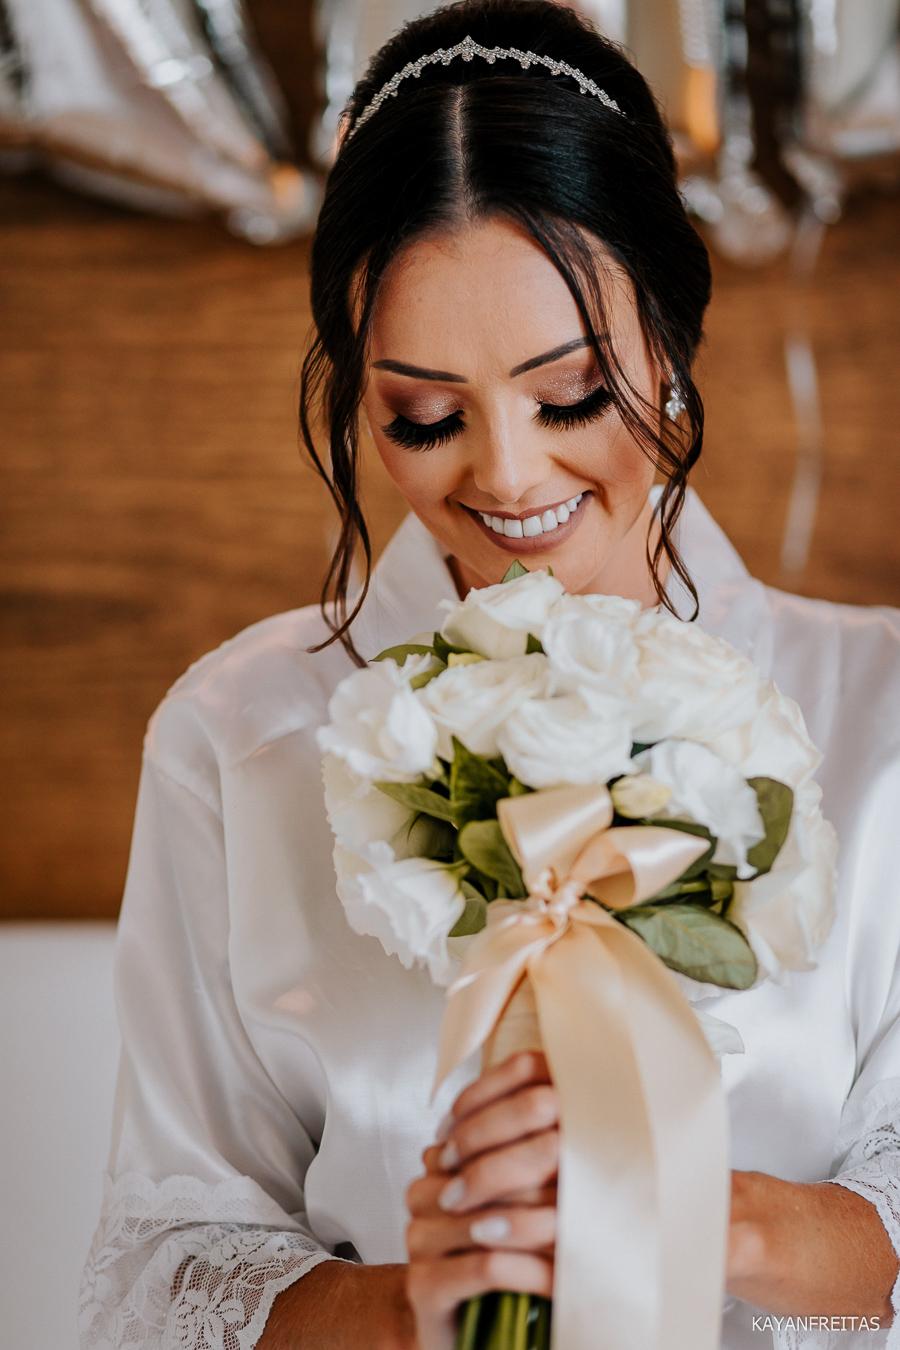 casamento-indaia-floripa-0006 Casamento Indaiá Florianópolis - Deise e Dário